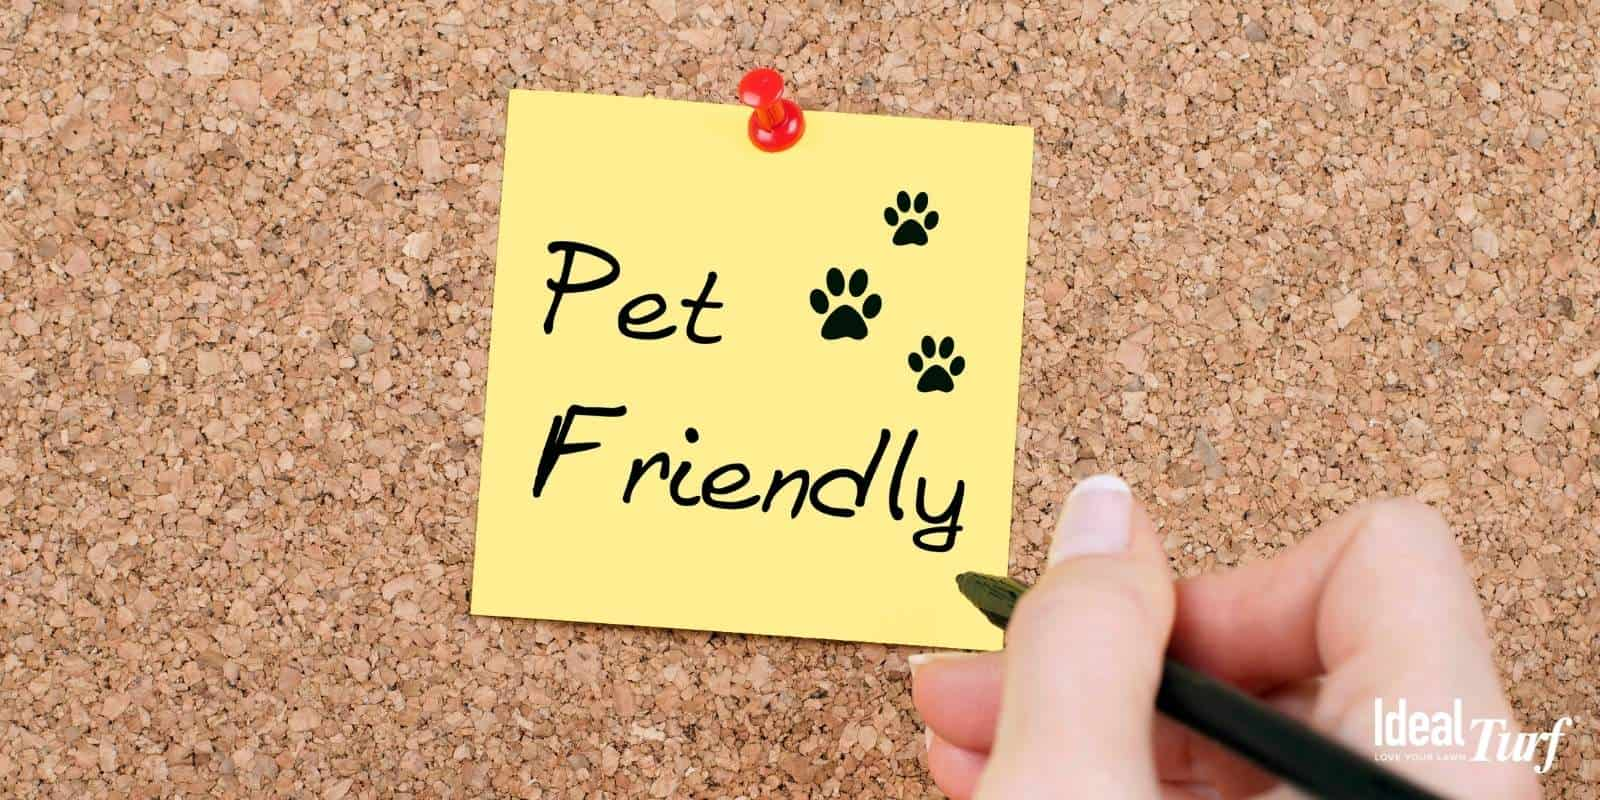 2. Pet-Friendly